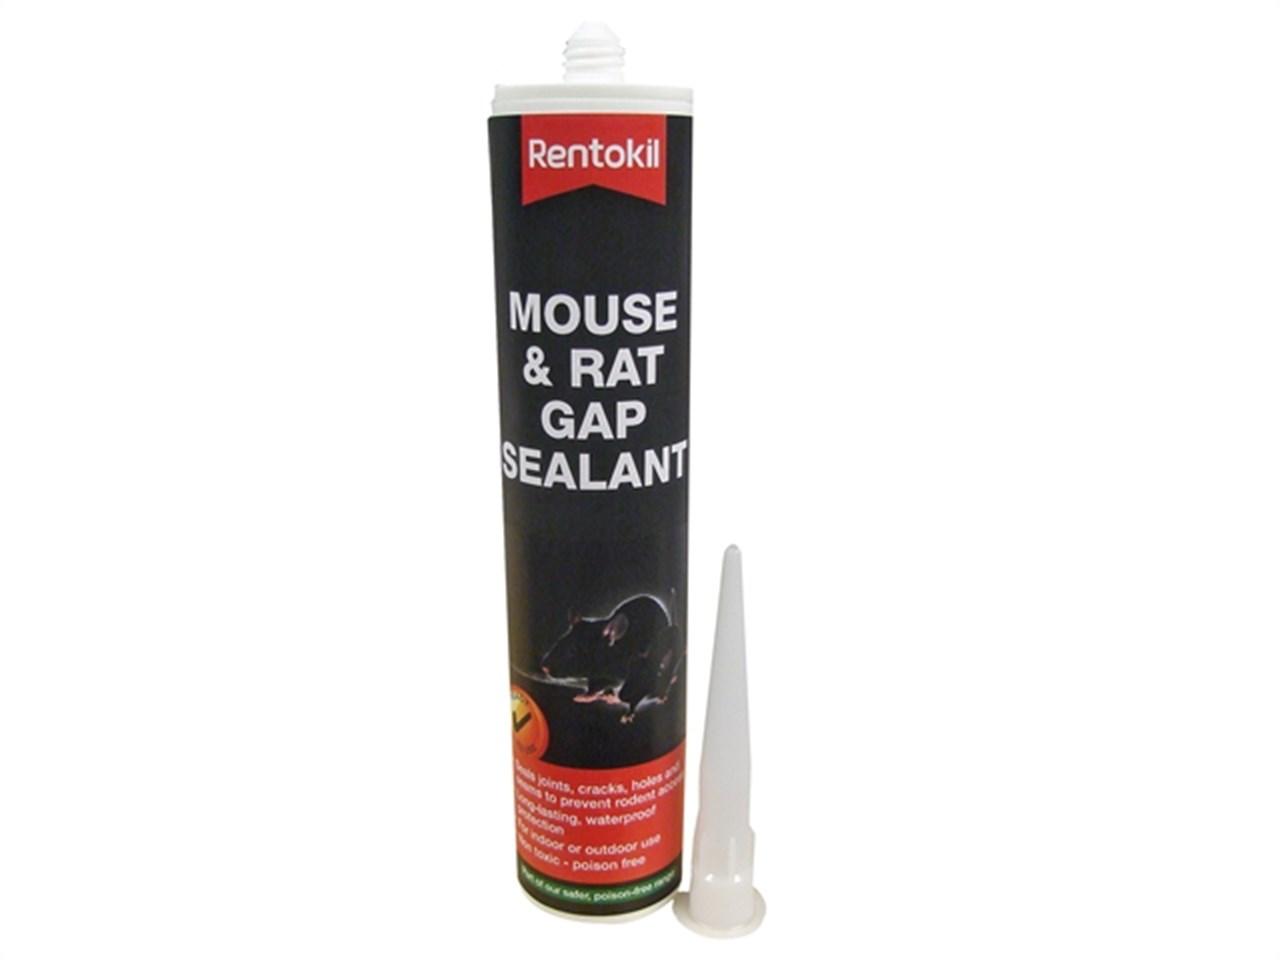 Rentokil FMS01 Mouse and Rat Gap Sealant